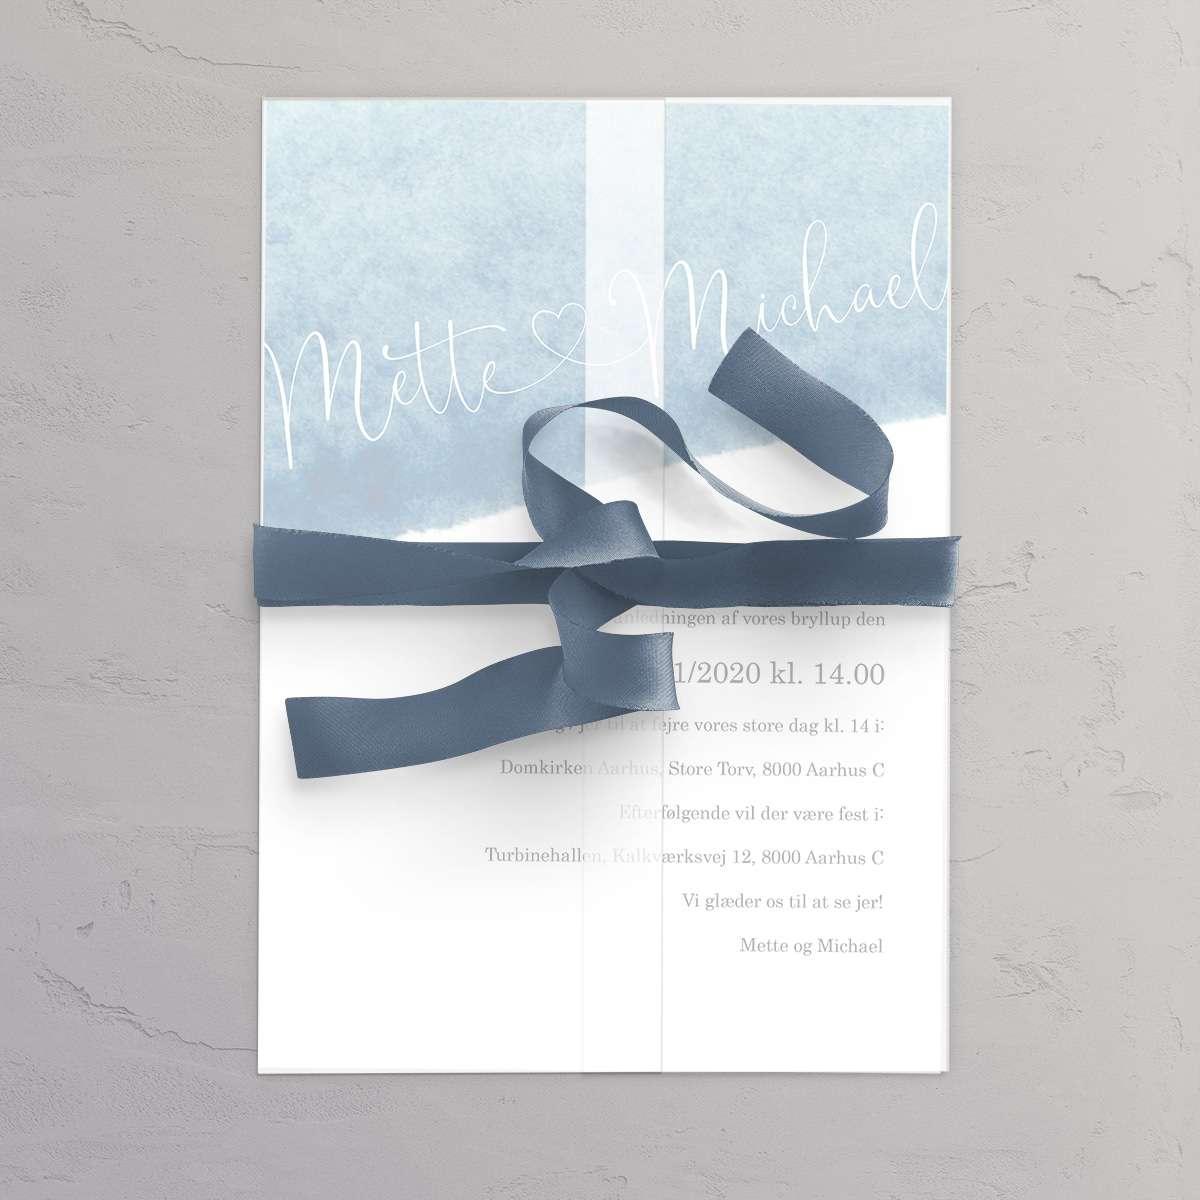 Bryllupsinvitation Something Blue med vellumcover, satinbånd i farven Smoke Blue og foret kuvert